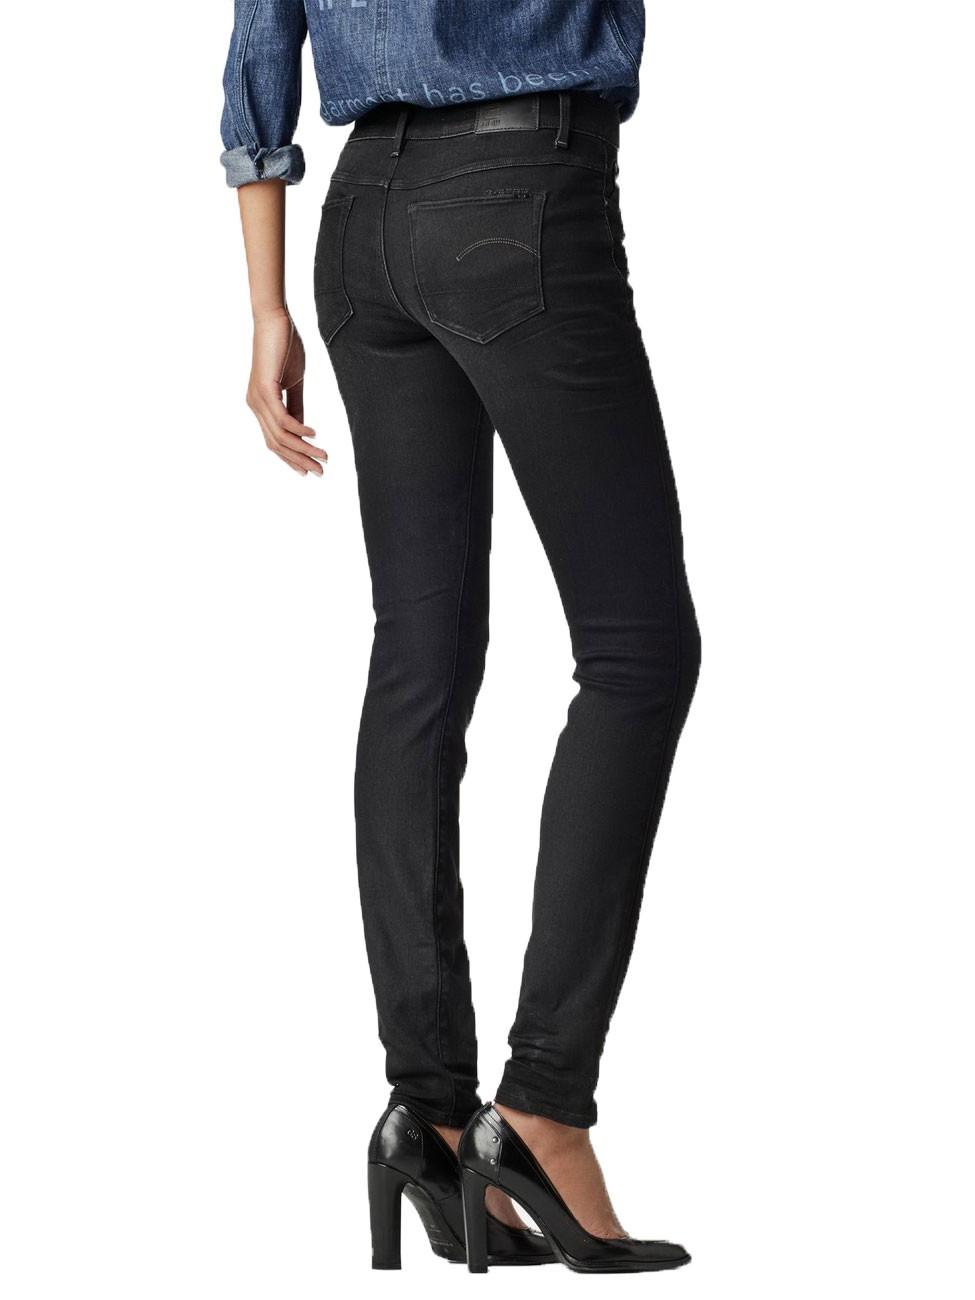 g star damen jeans 3301 contour damen high waist skinny. Black Bedroom Furniture Sets. Home Design Ideas